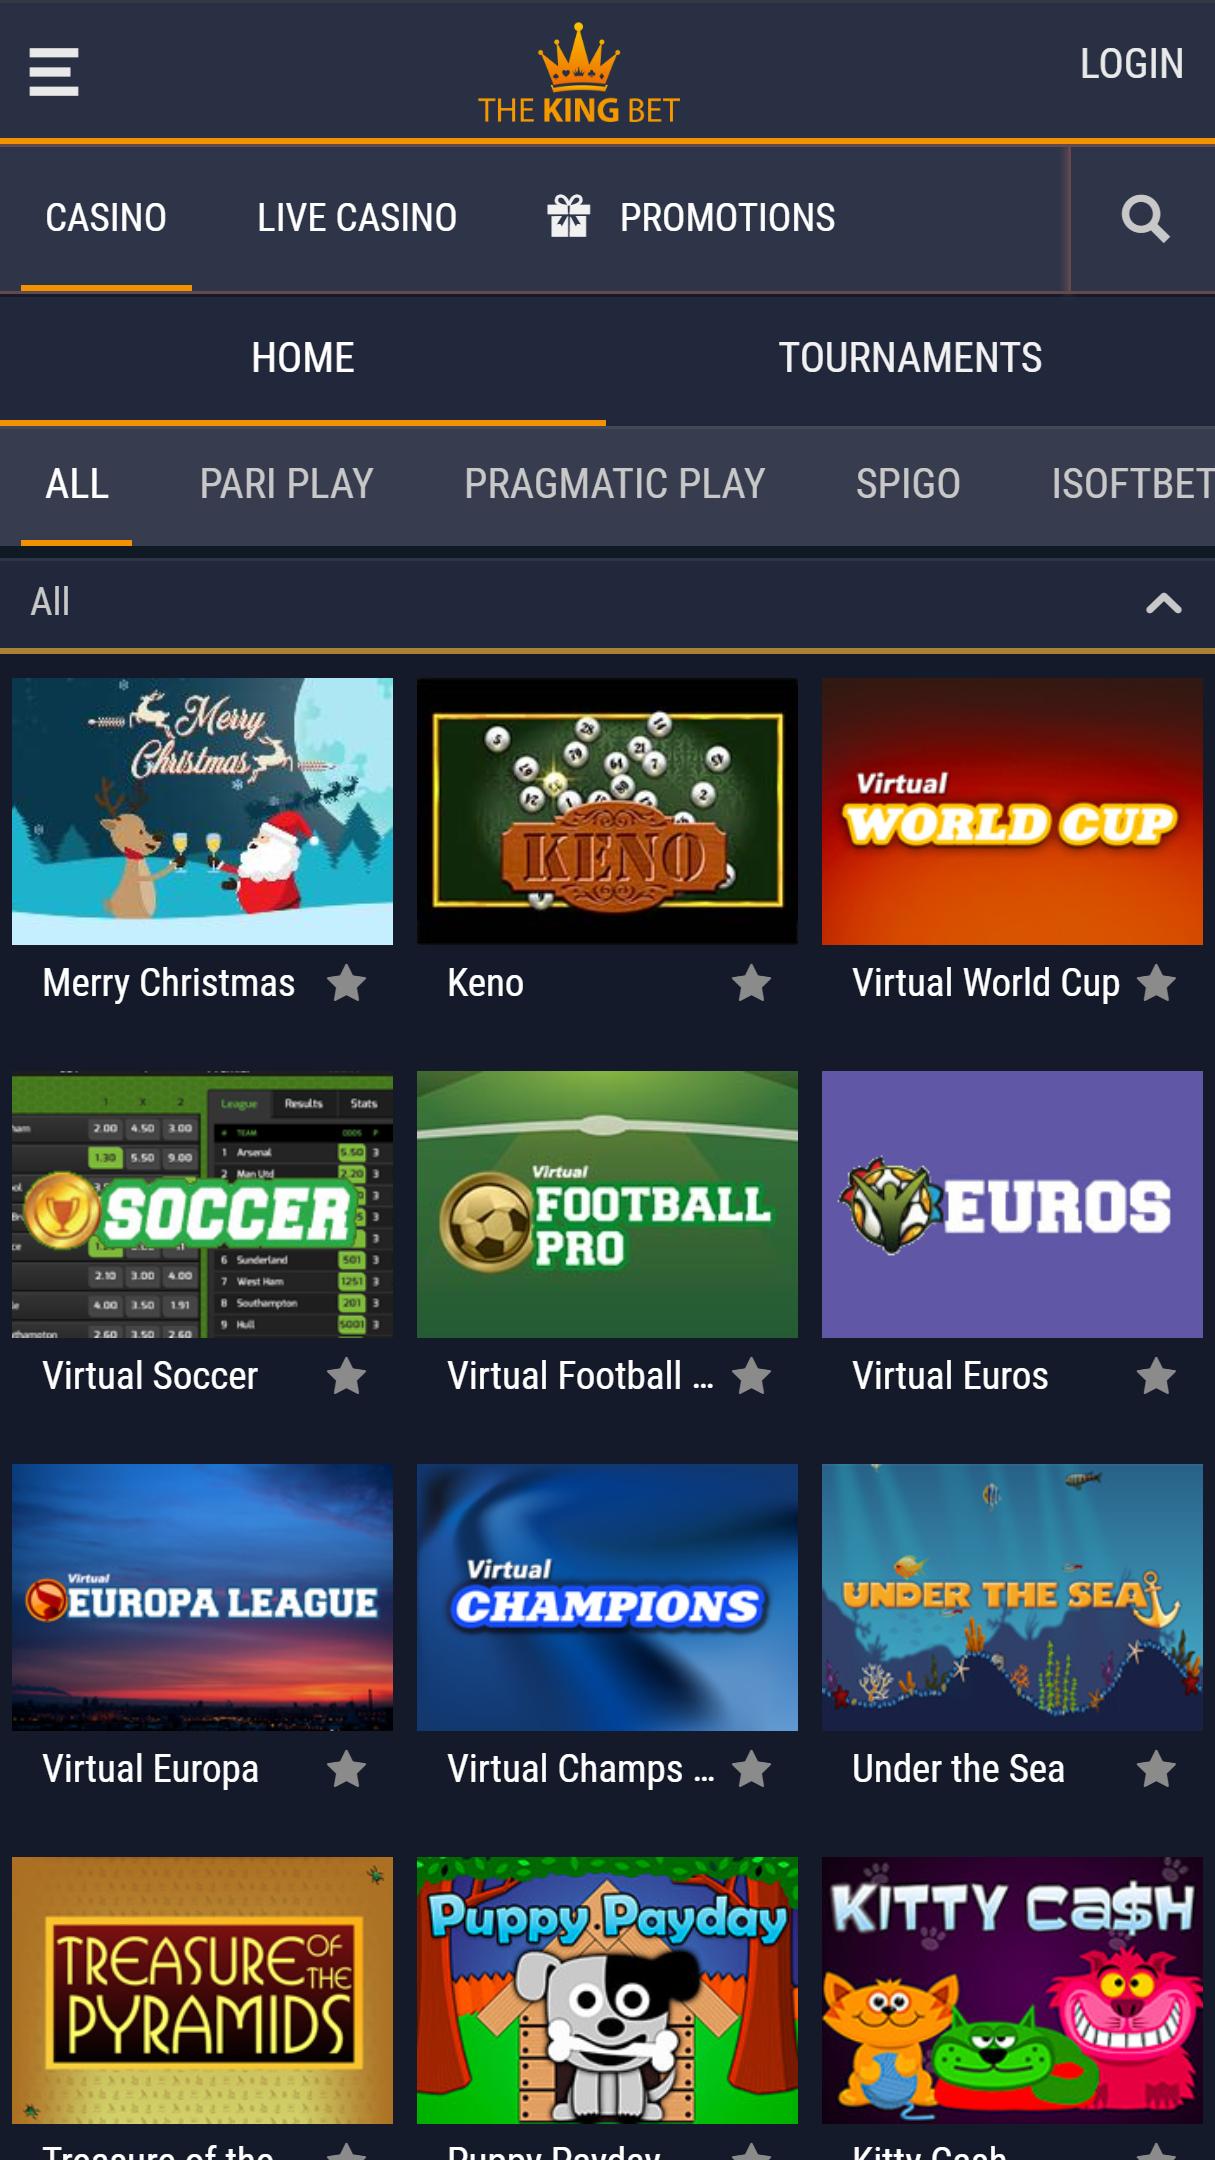 TheKingBet App Homepage